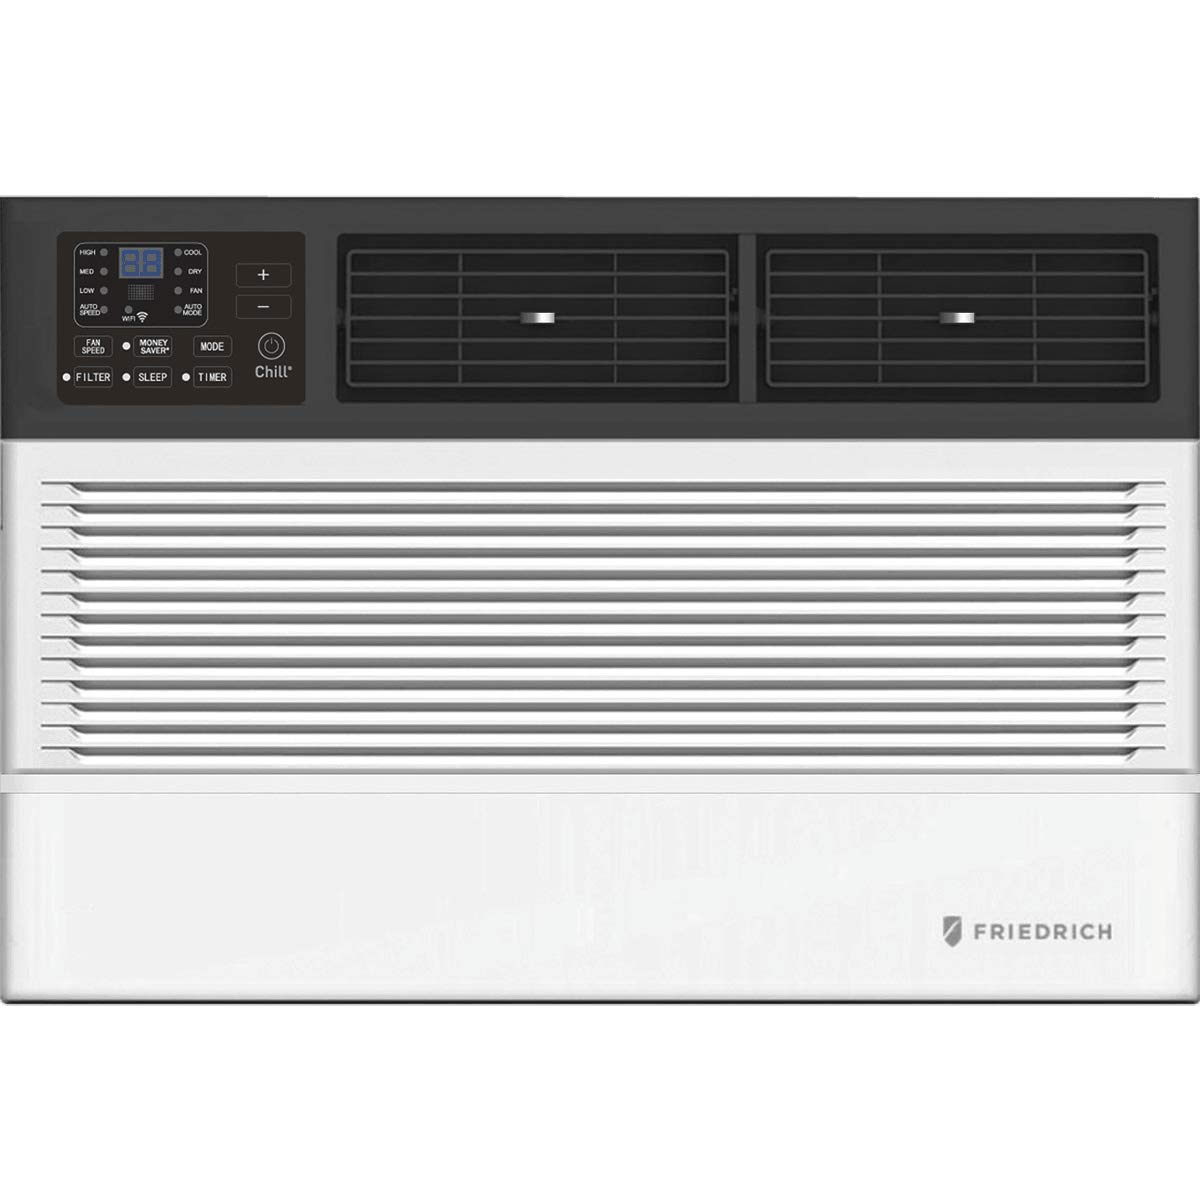 Friedrich Chill Premier 6,000 BTU Smart Window Air Conditioner with Built-in WIFI by Friedrich